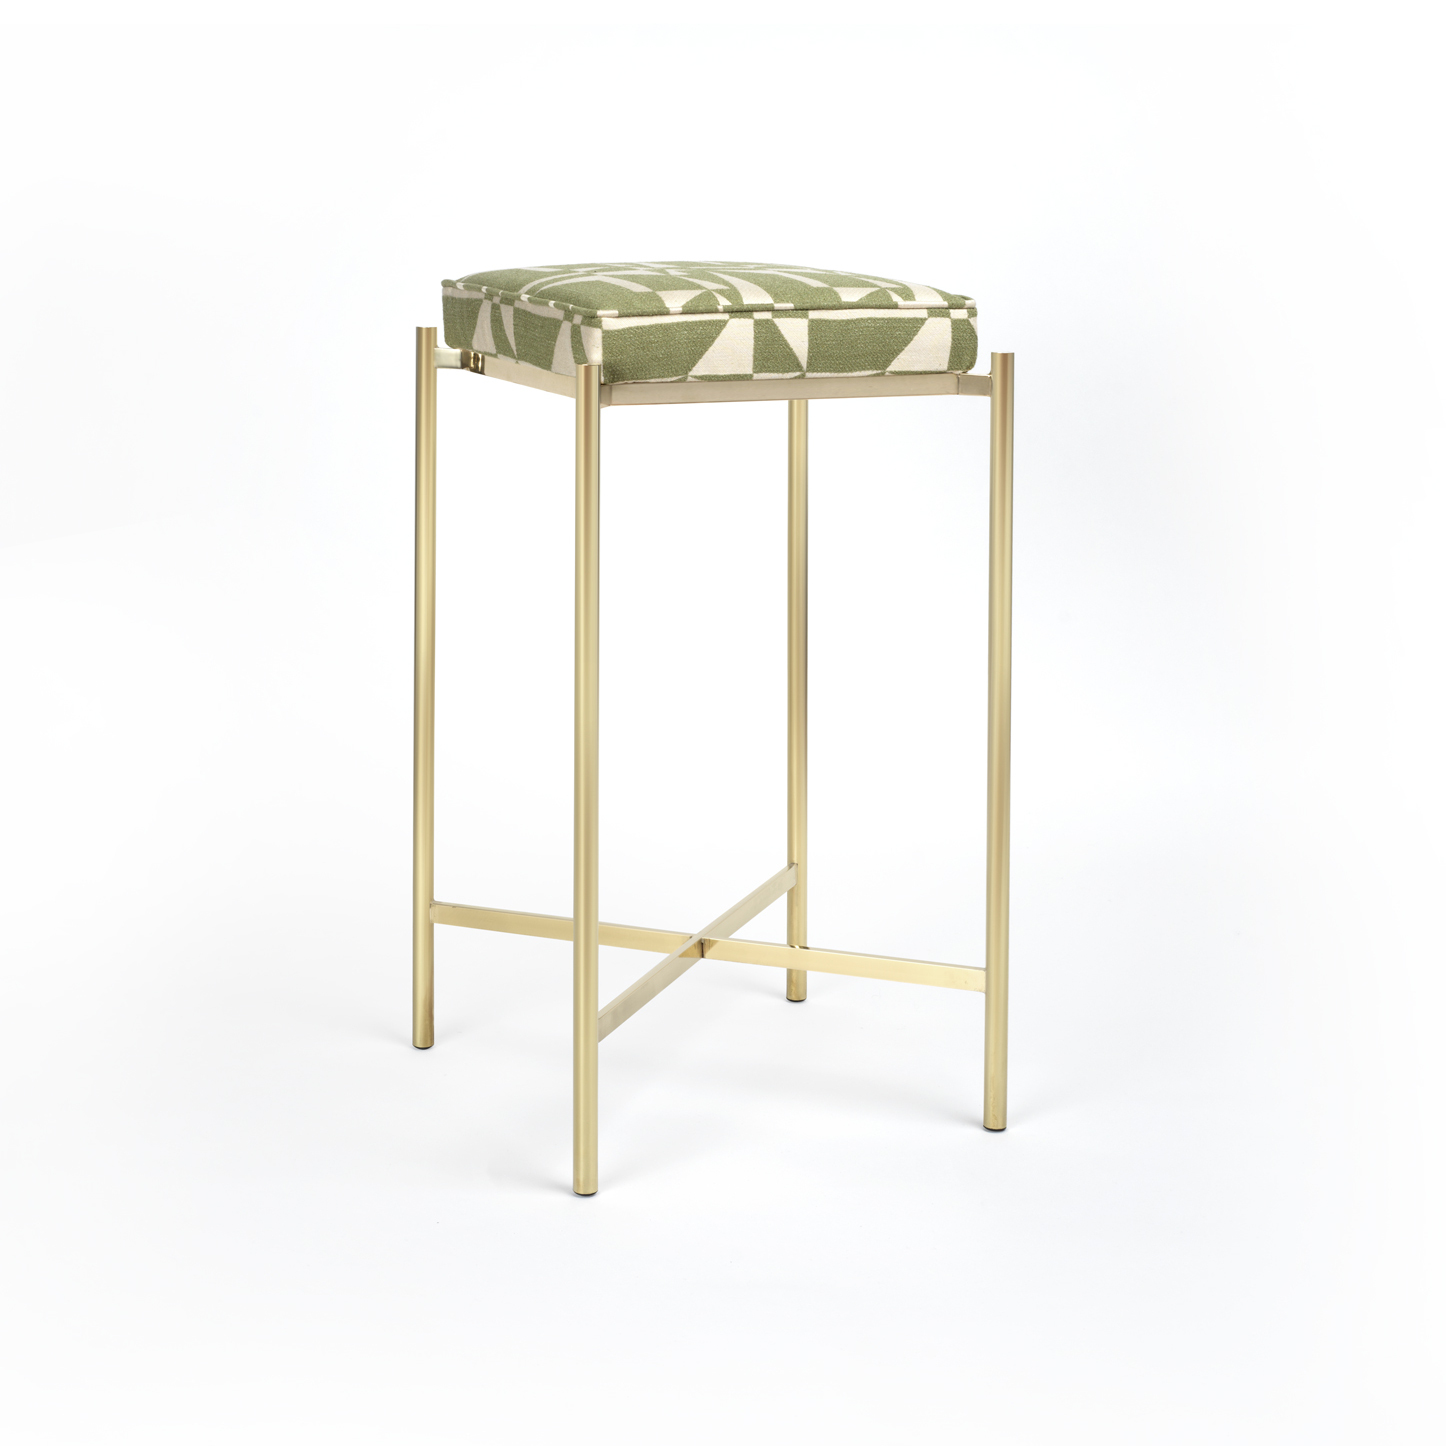 Olivetti stool